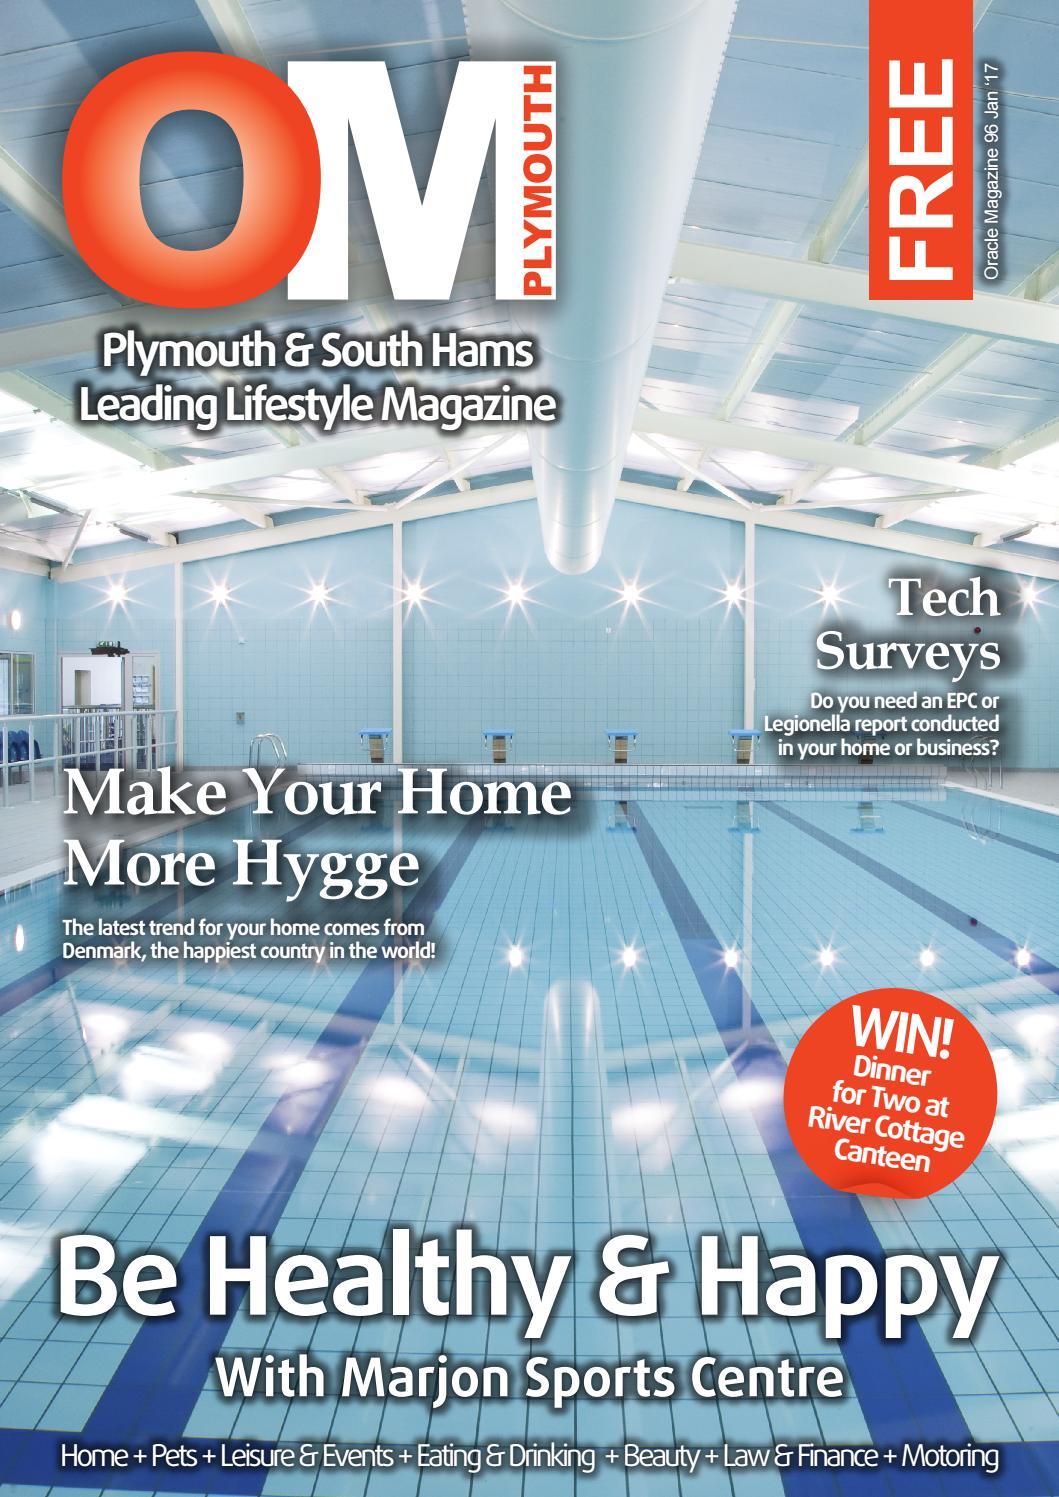 OM Magazine, Issue 96, January 2017 by OM Magazine - issuu